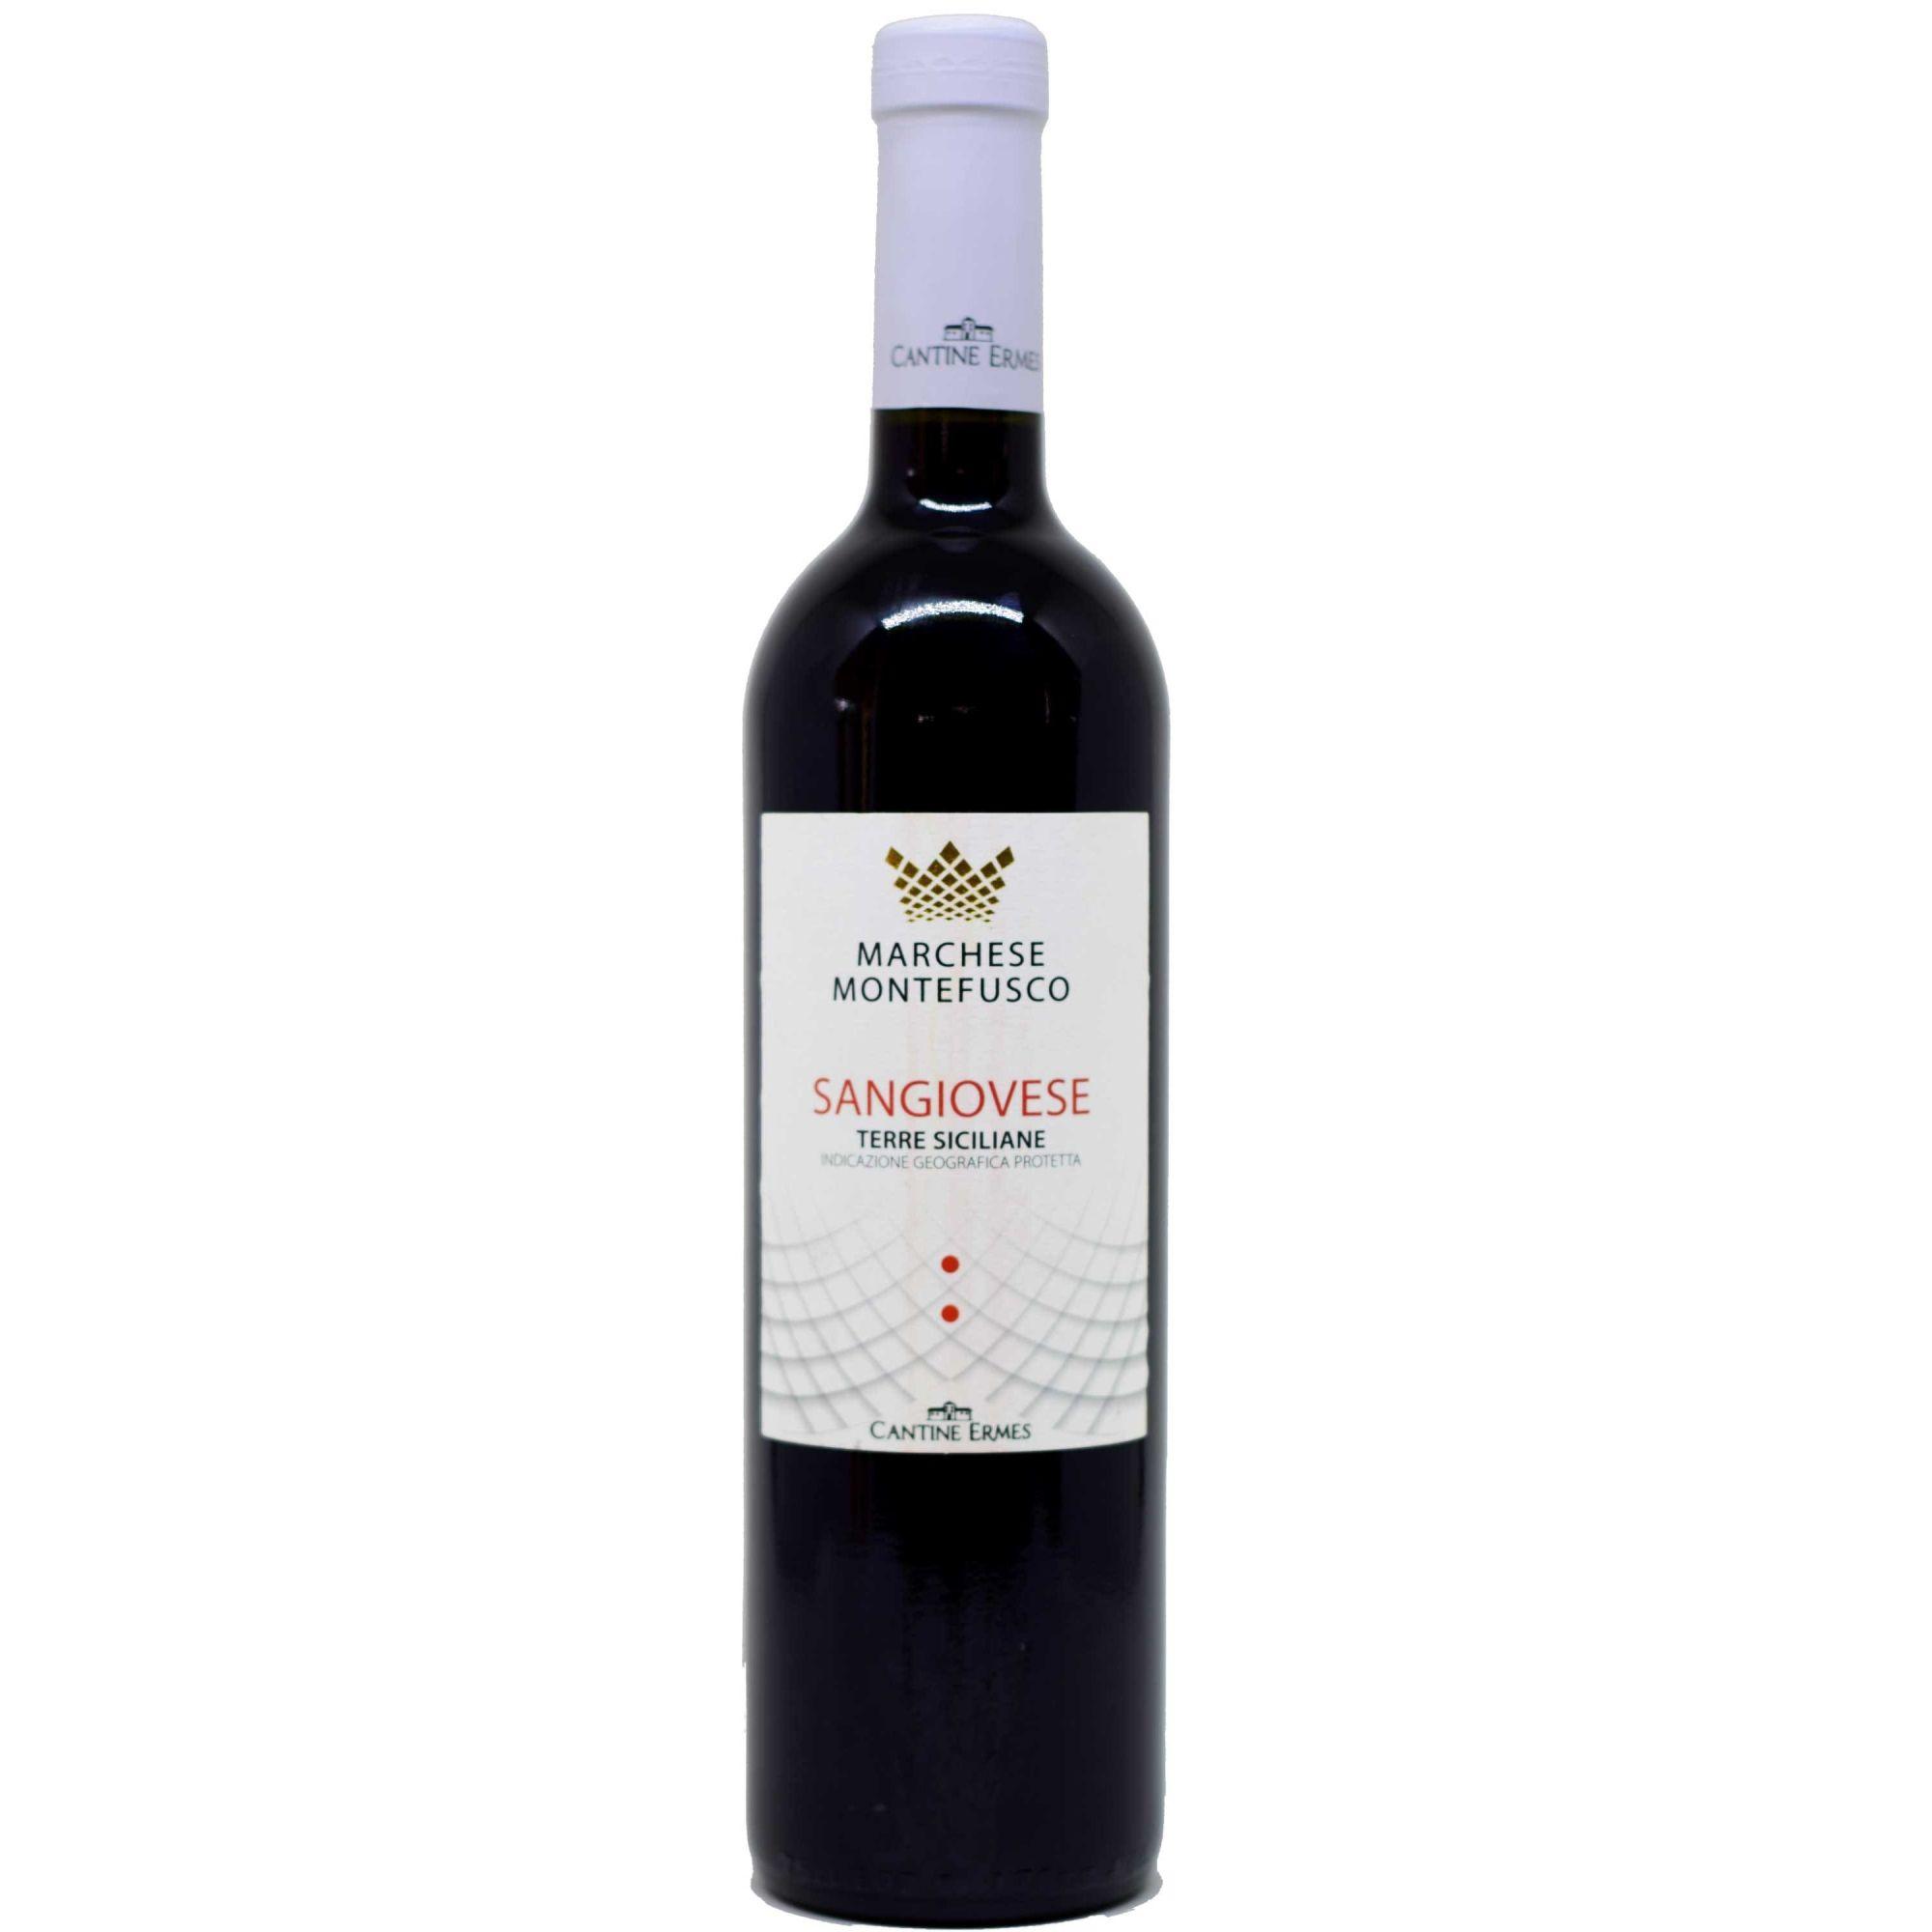 Vinho Marchese Montefusco Sangiovese IGP